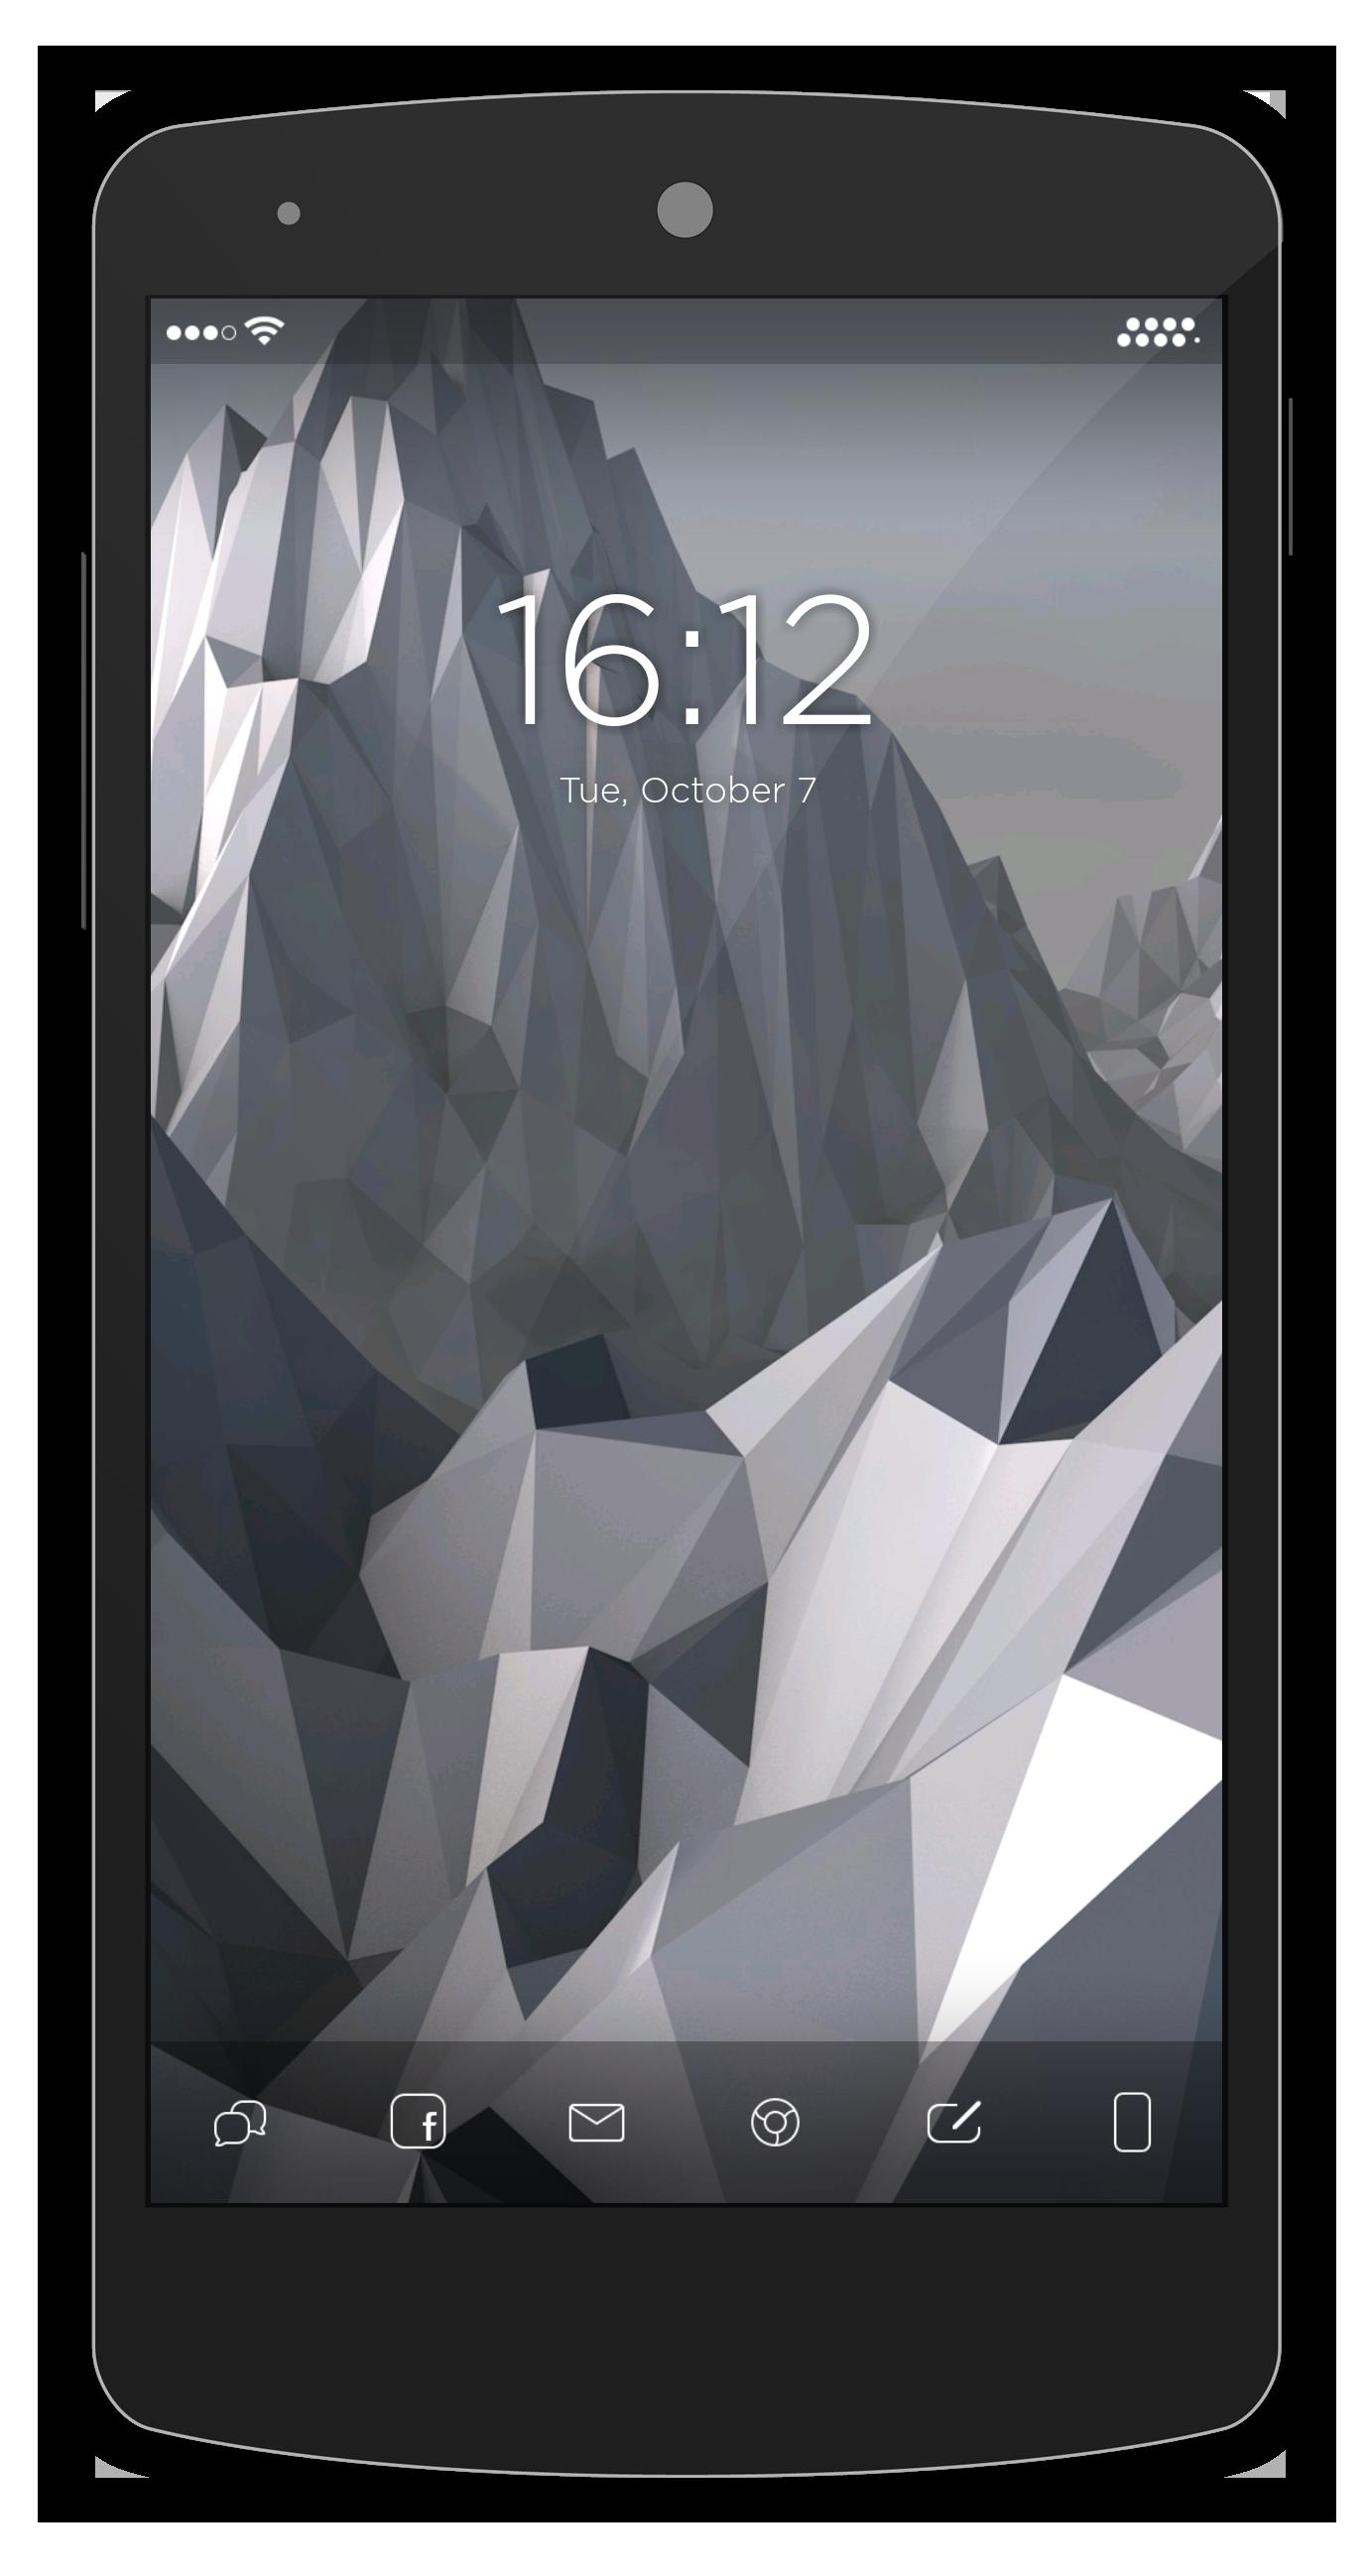 android kitkat wallpaper xda